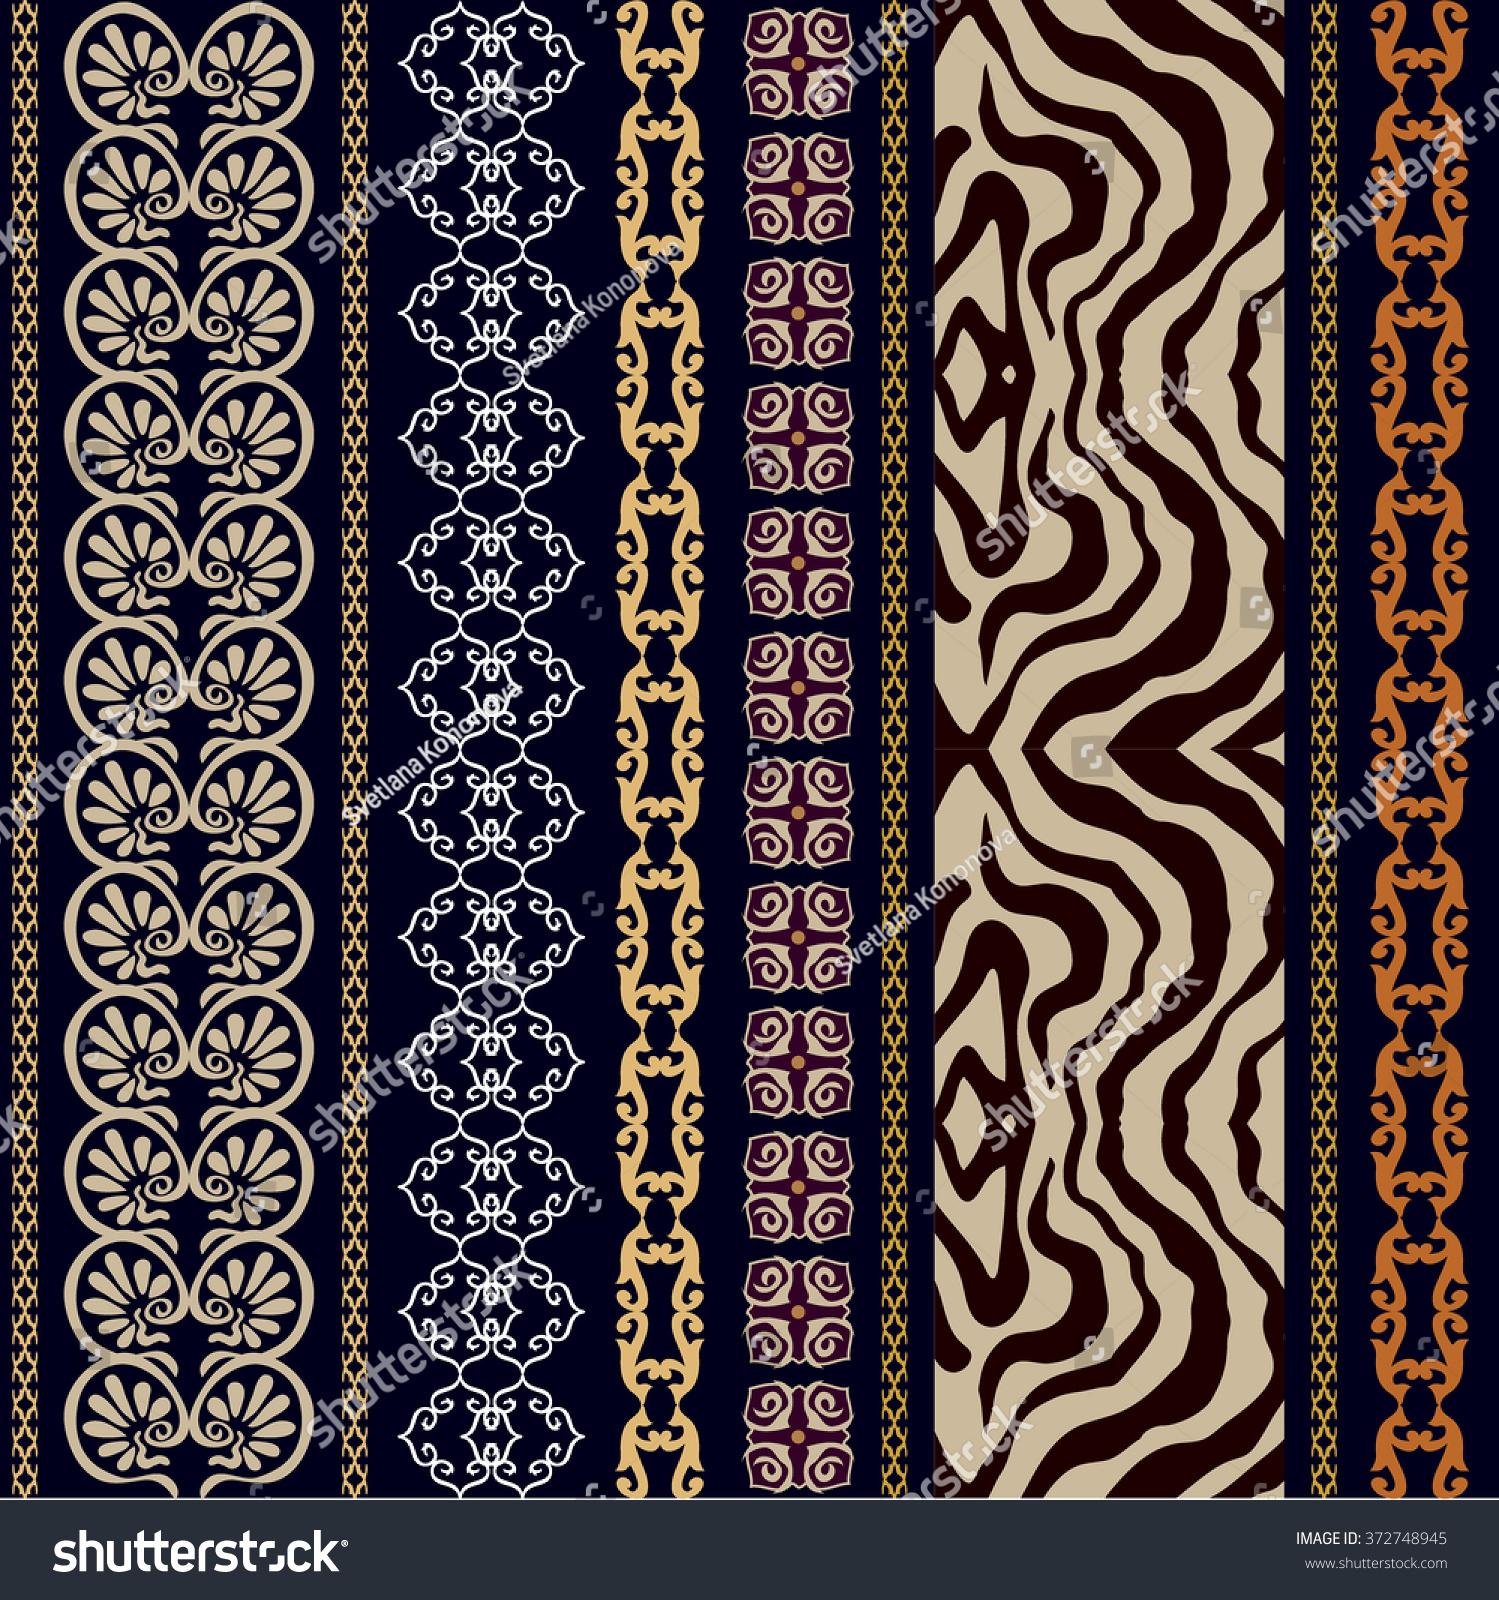 Seamless Silk Wallpaper Vintage Ancient Meander Stock Vector